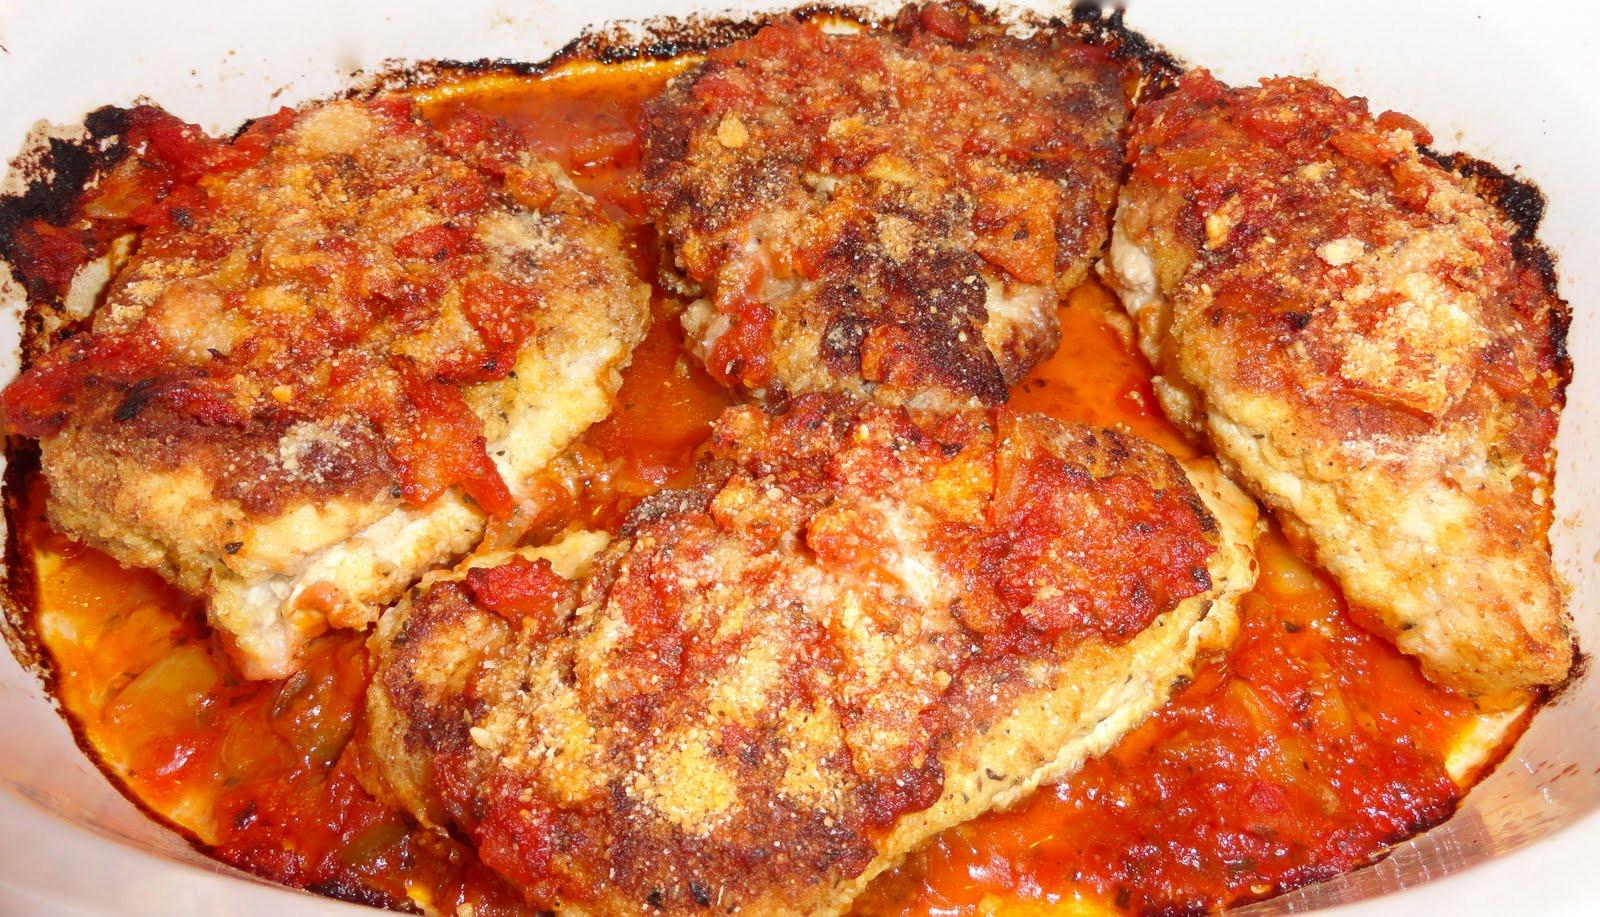 Baked Italian Chicken  Simple Pleasures in a plex World Chicken Mio amore